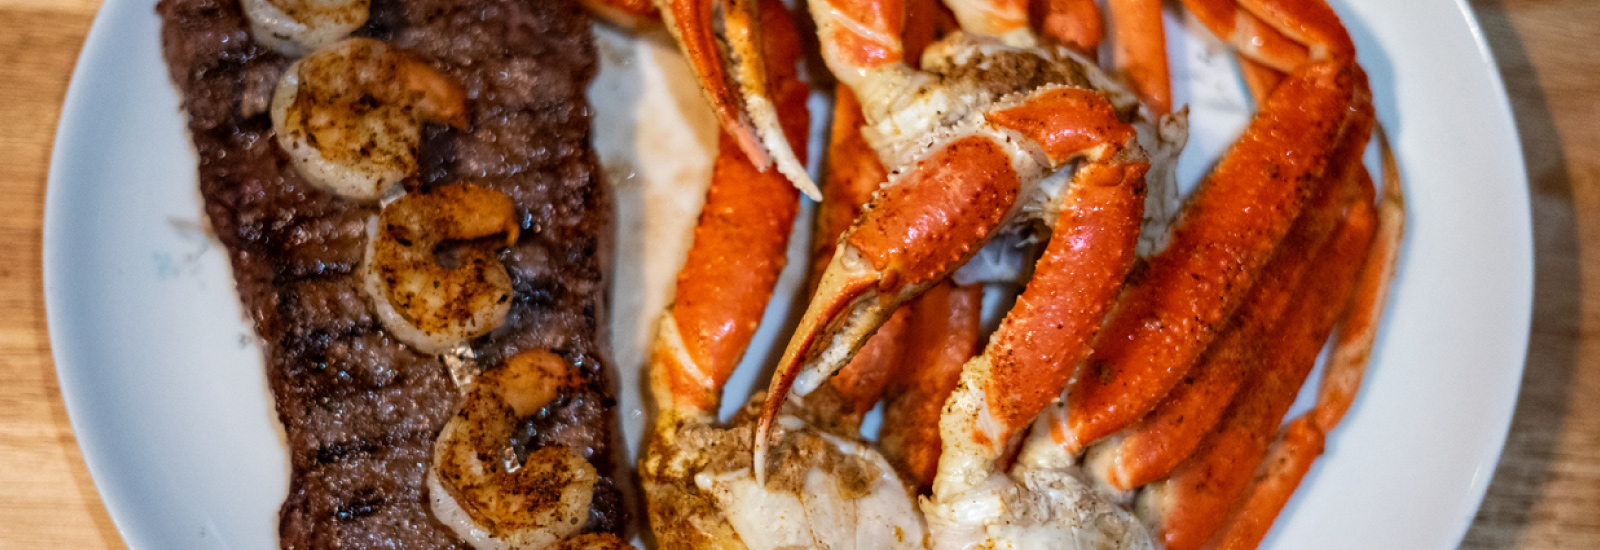 Steak and Seafood Restaurants in Boston